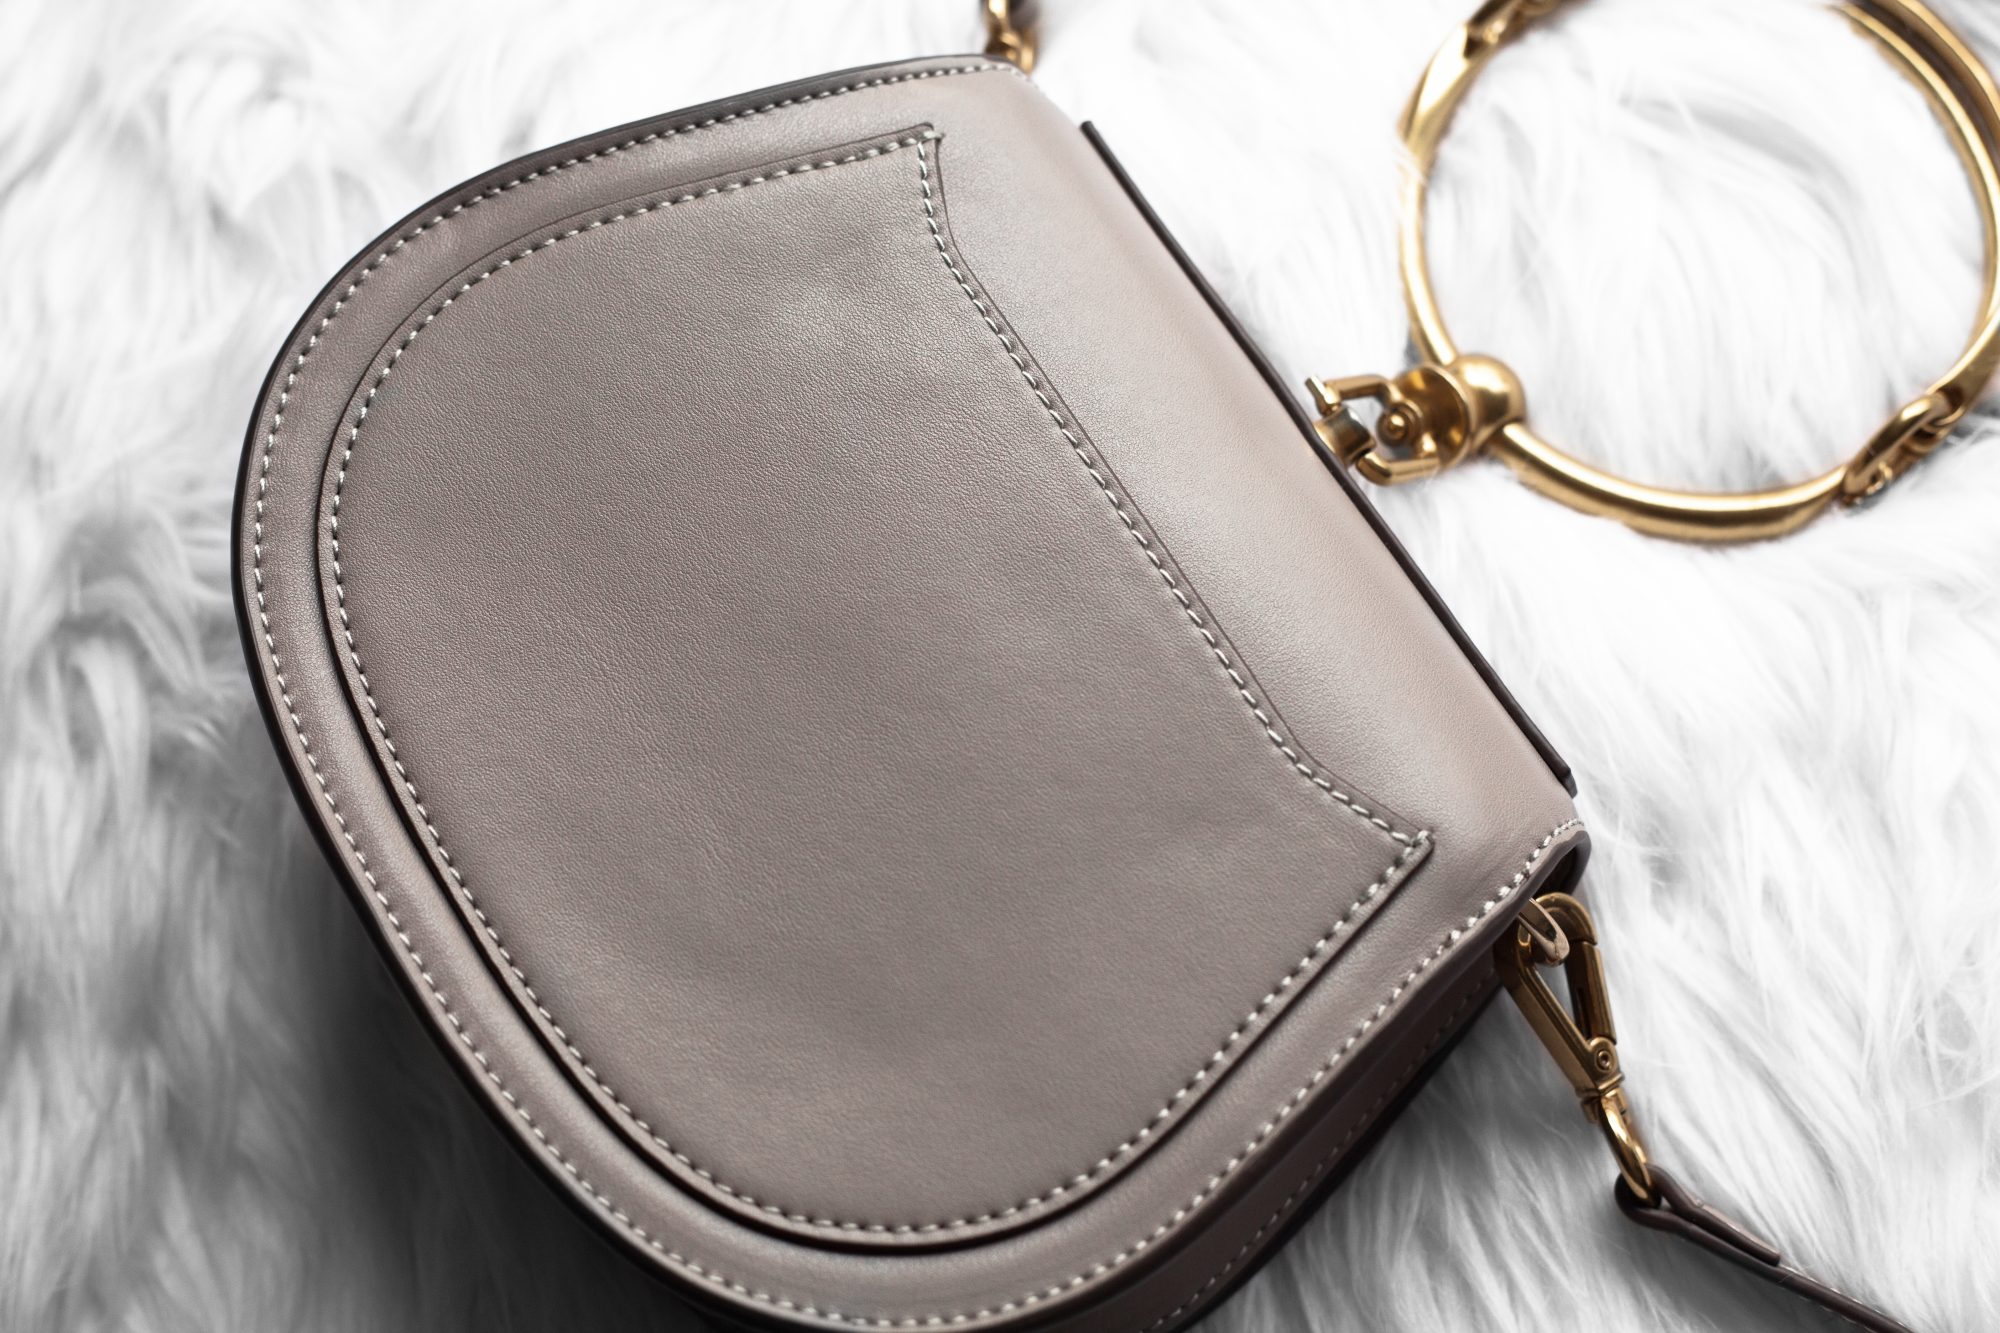 e984b121b70b Chloe s popular small Nile bracelet handbag is priced at a hefty  1